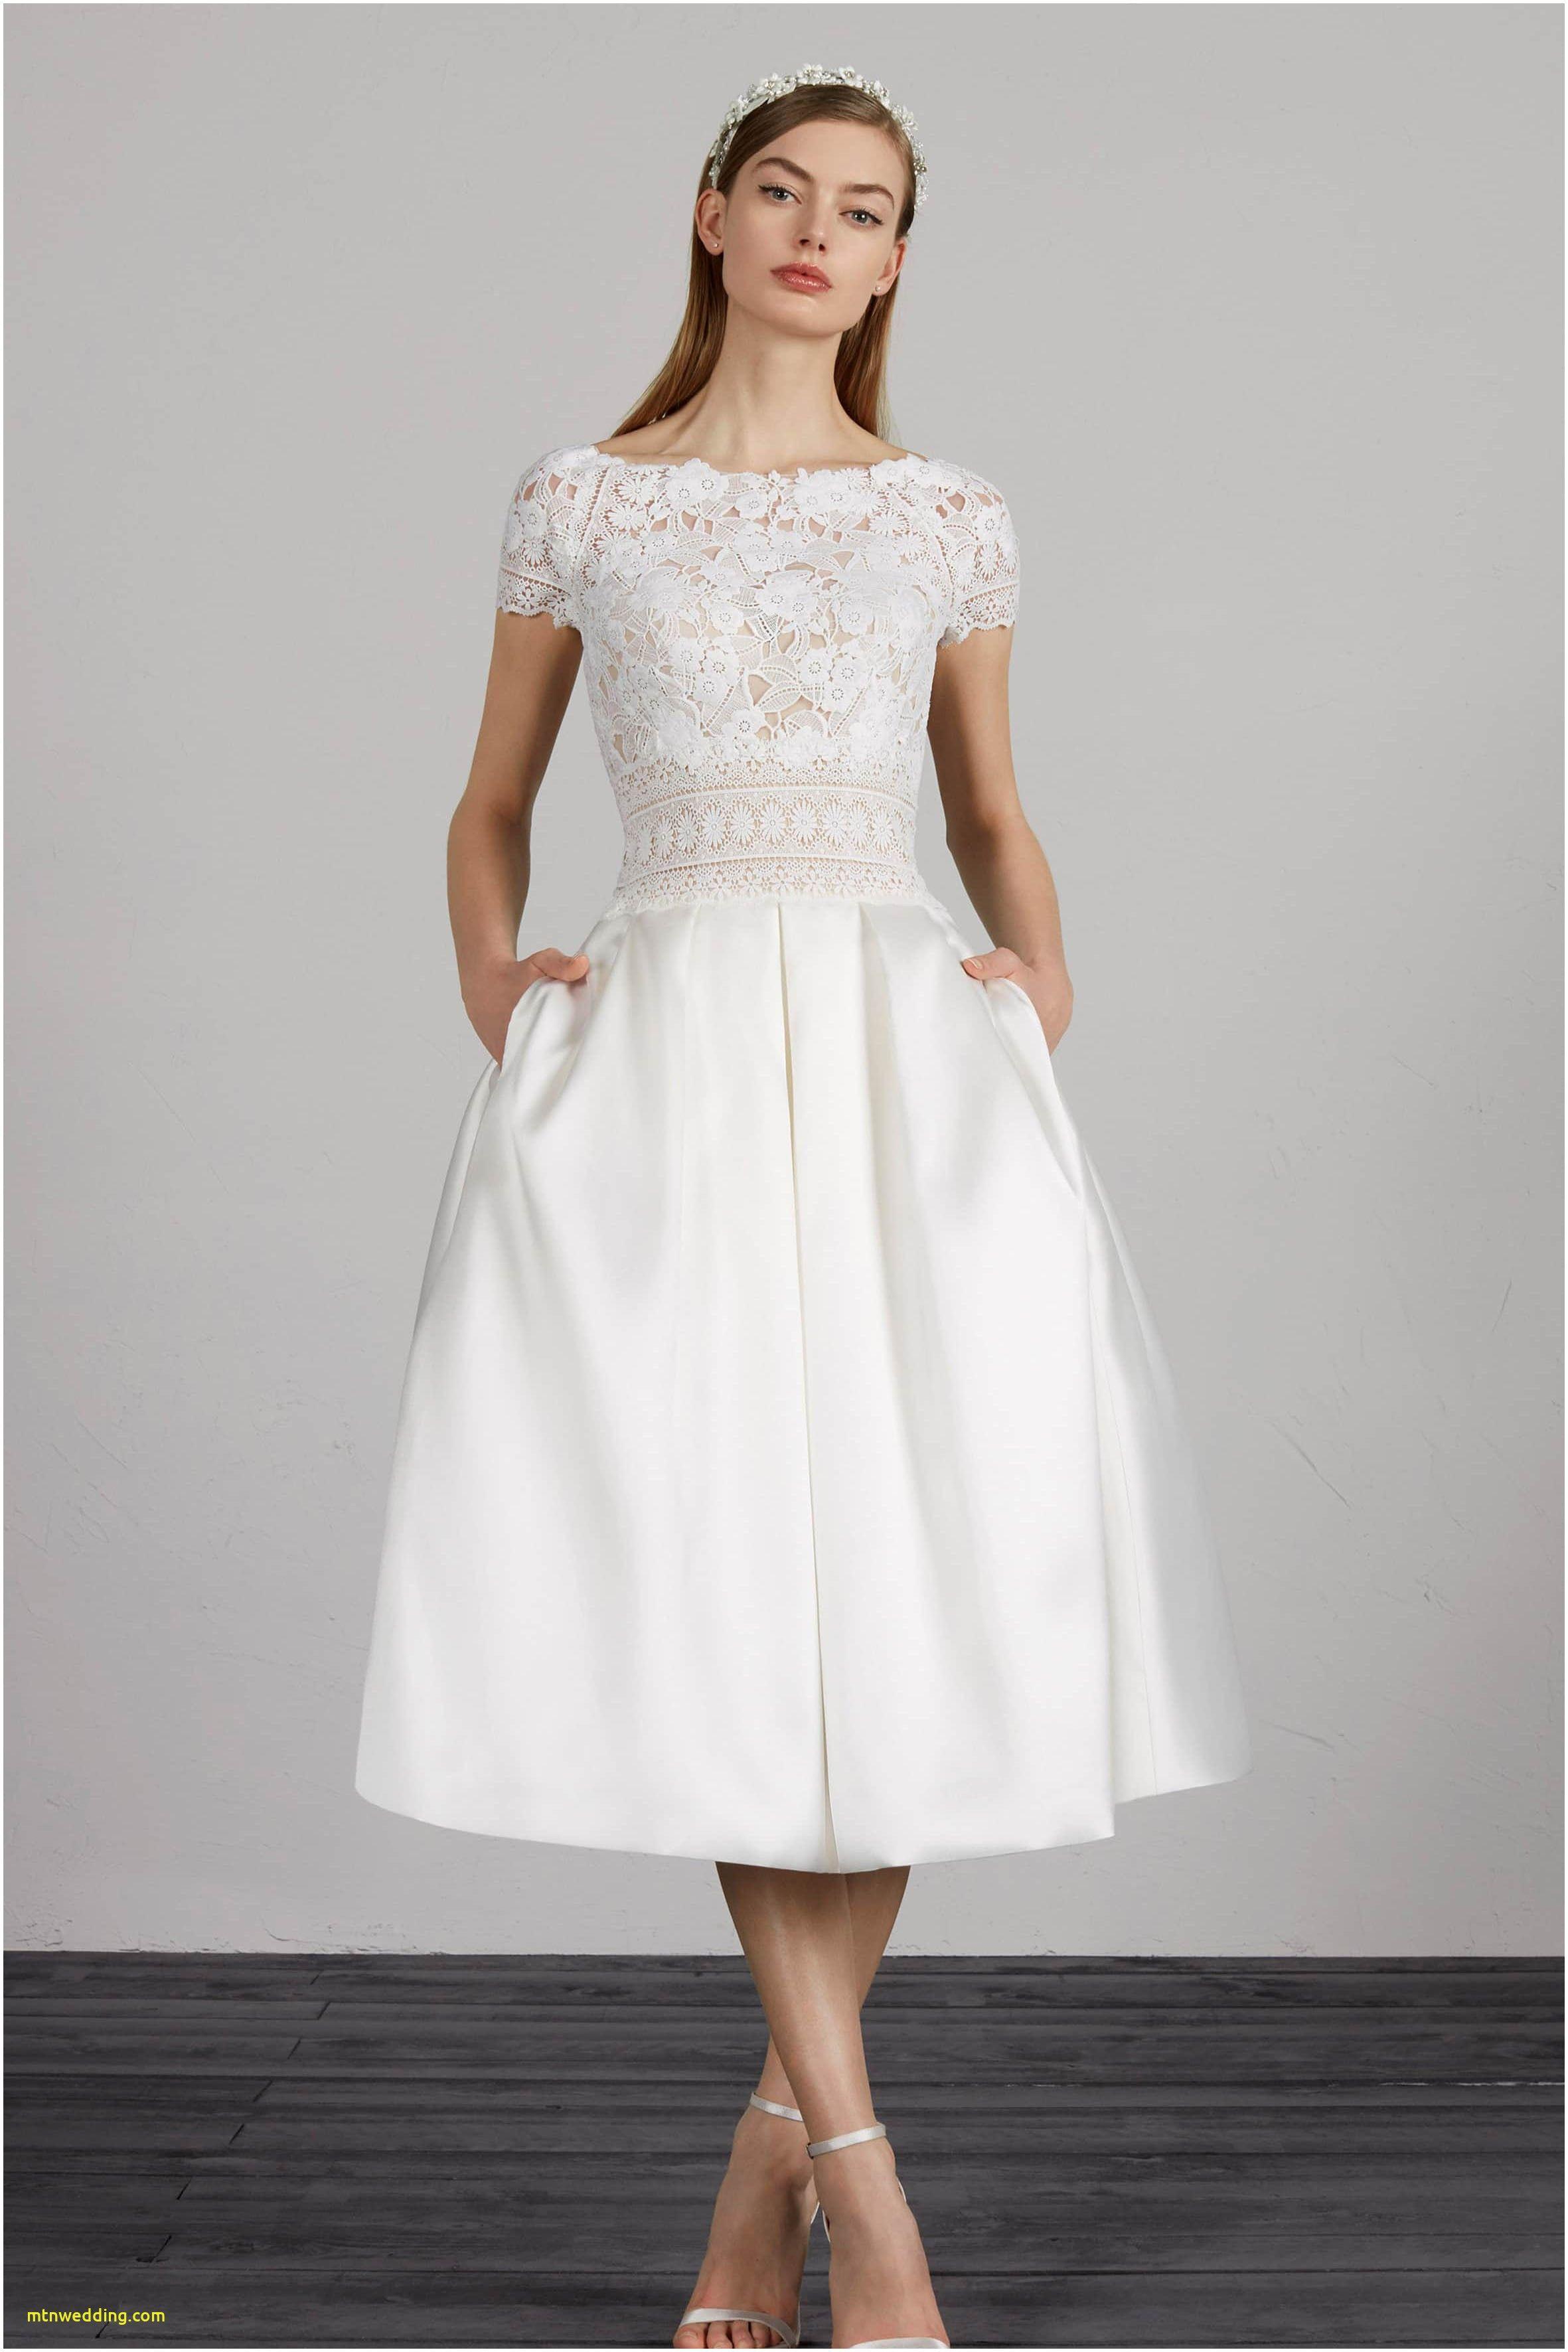 Unique 3 4 Sleeve Knee Length Wedding Dress